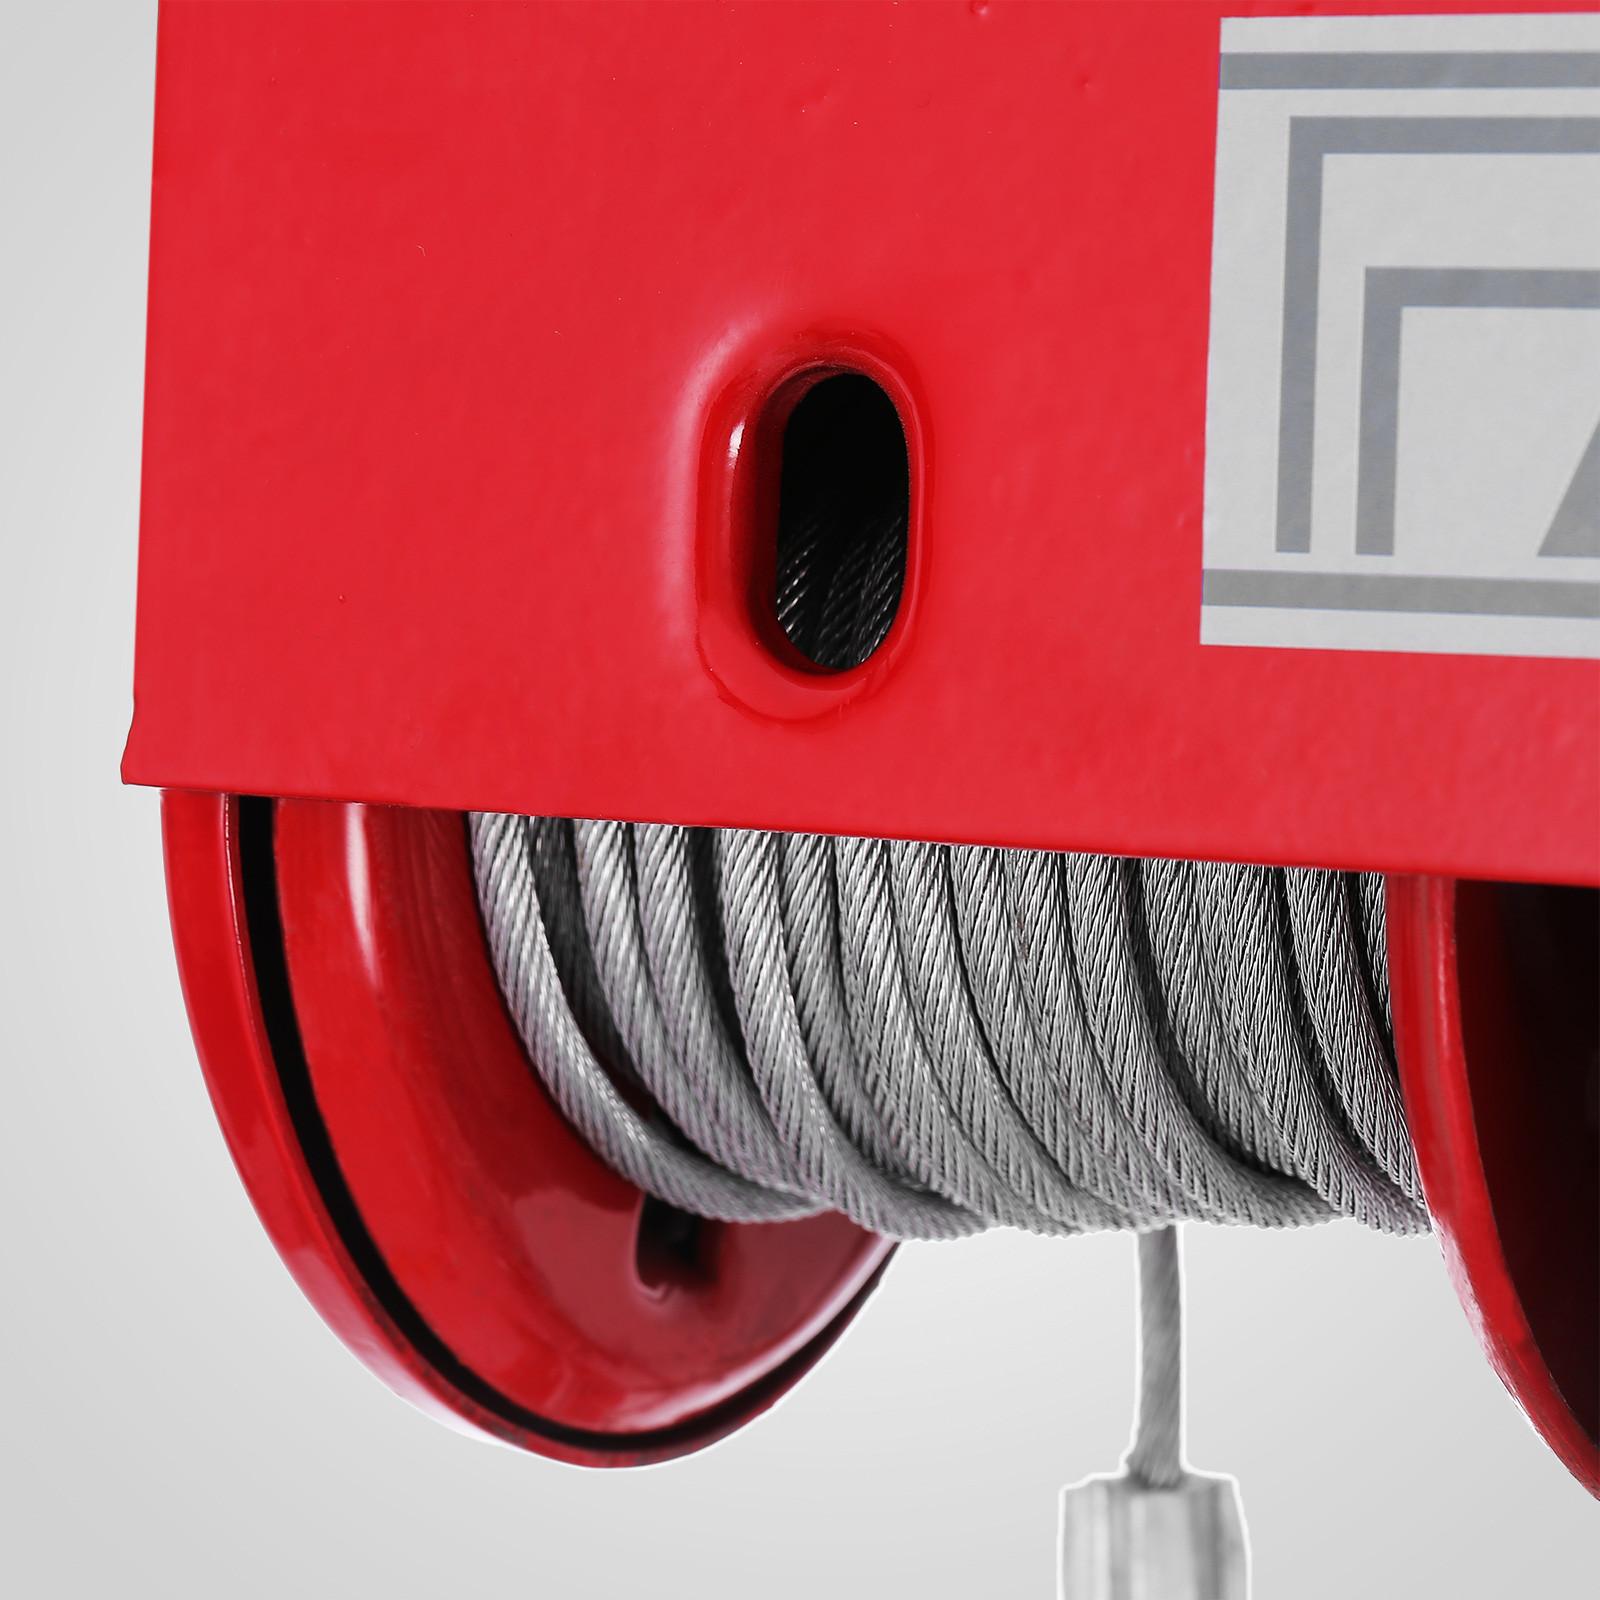 100kg-900kg-Electric-Hoist-Winch-Lifting-Engine-Crane-Cable-Lift-Hook-Garage miniature 32